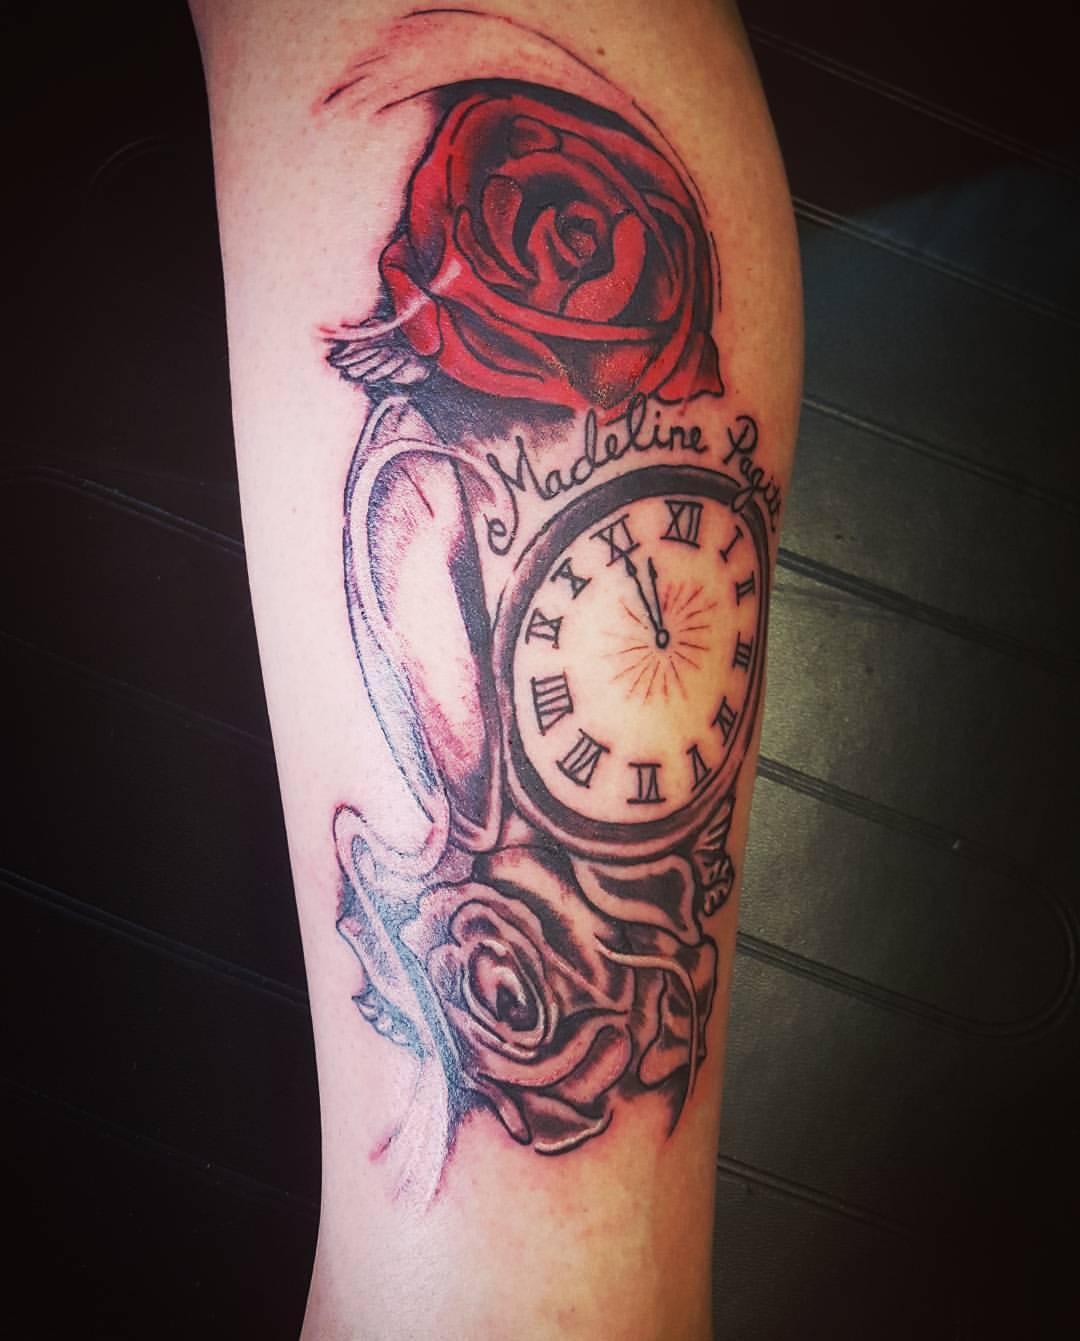 misty hatch rose tattoo